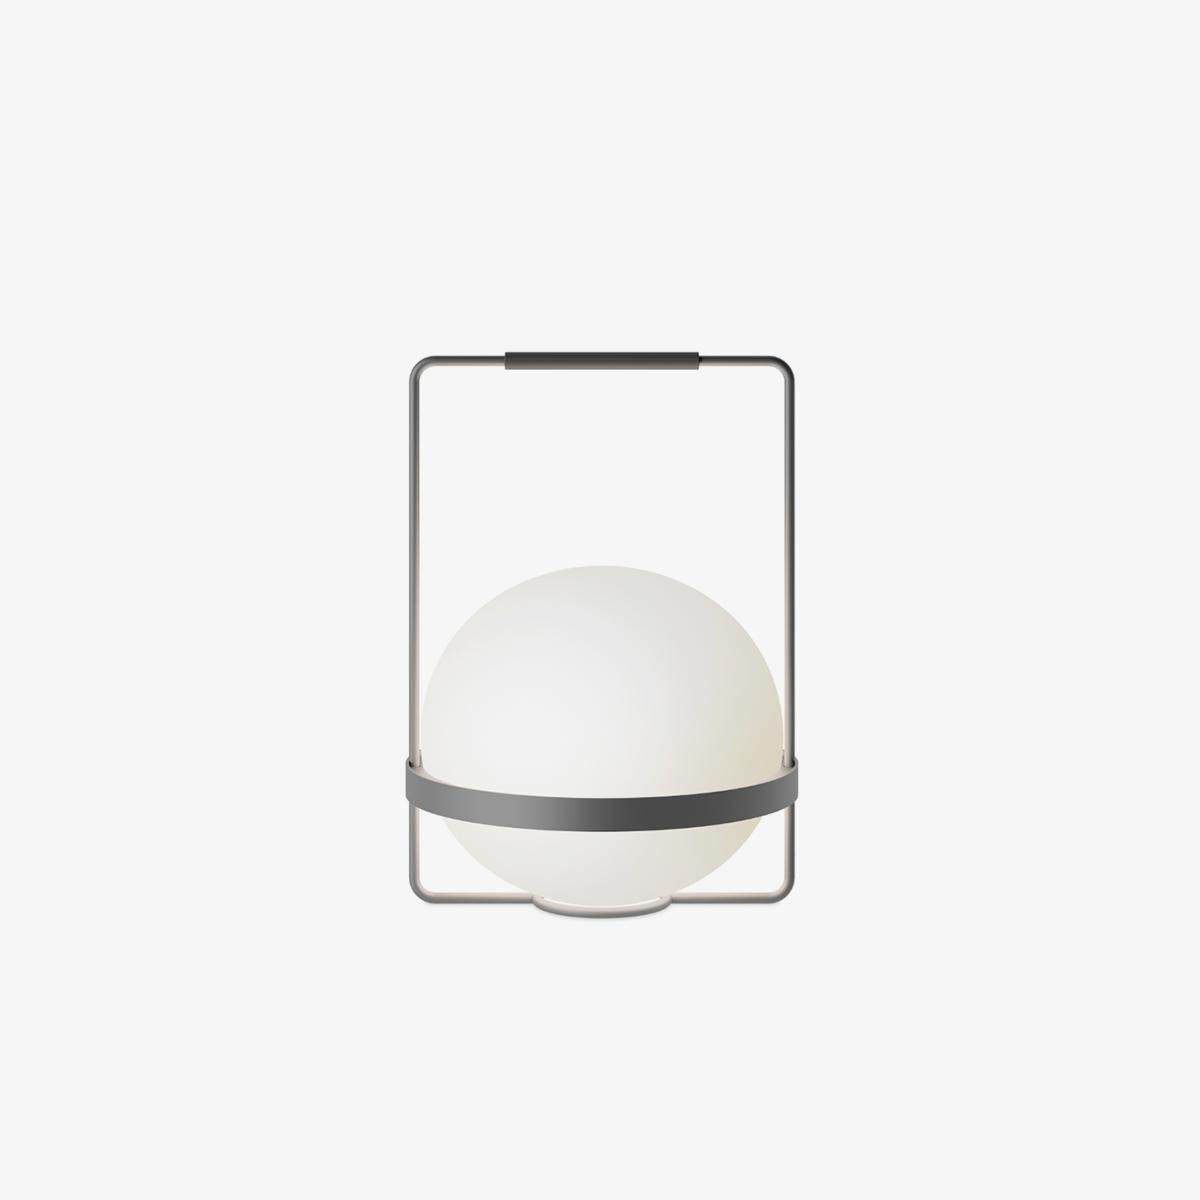 Lámpara de sobremesa Palma esfera grafito Vibia-0